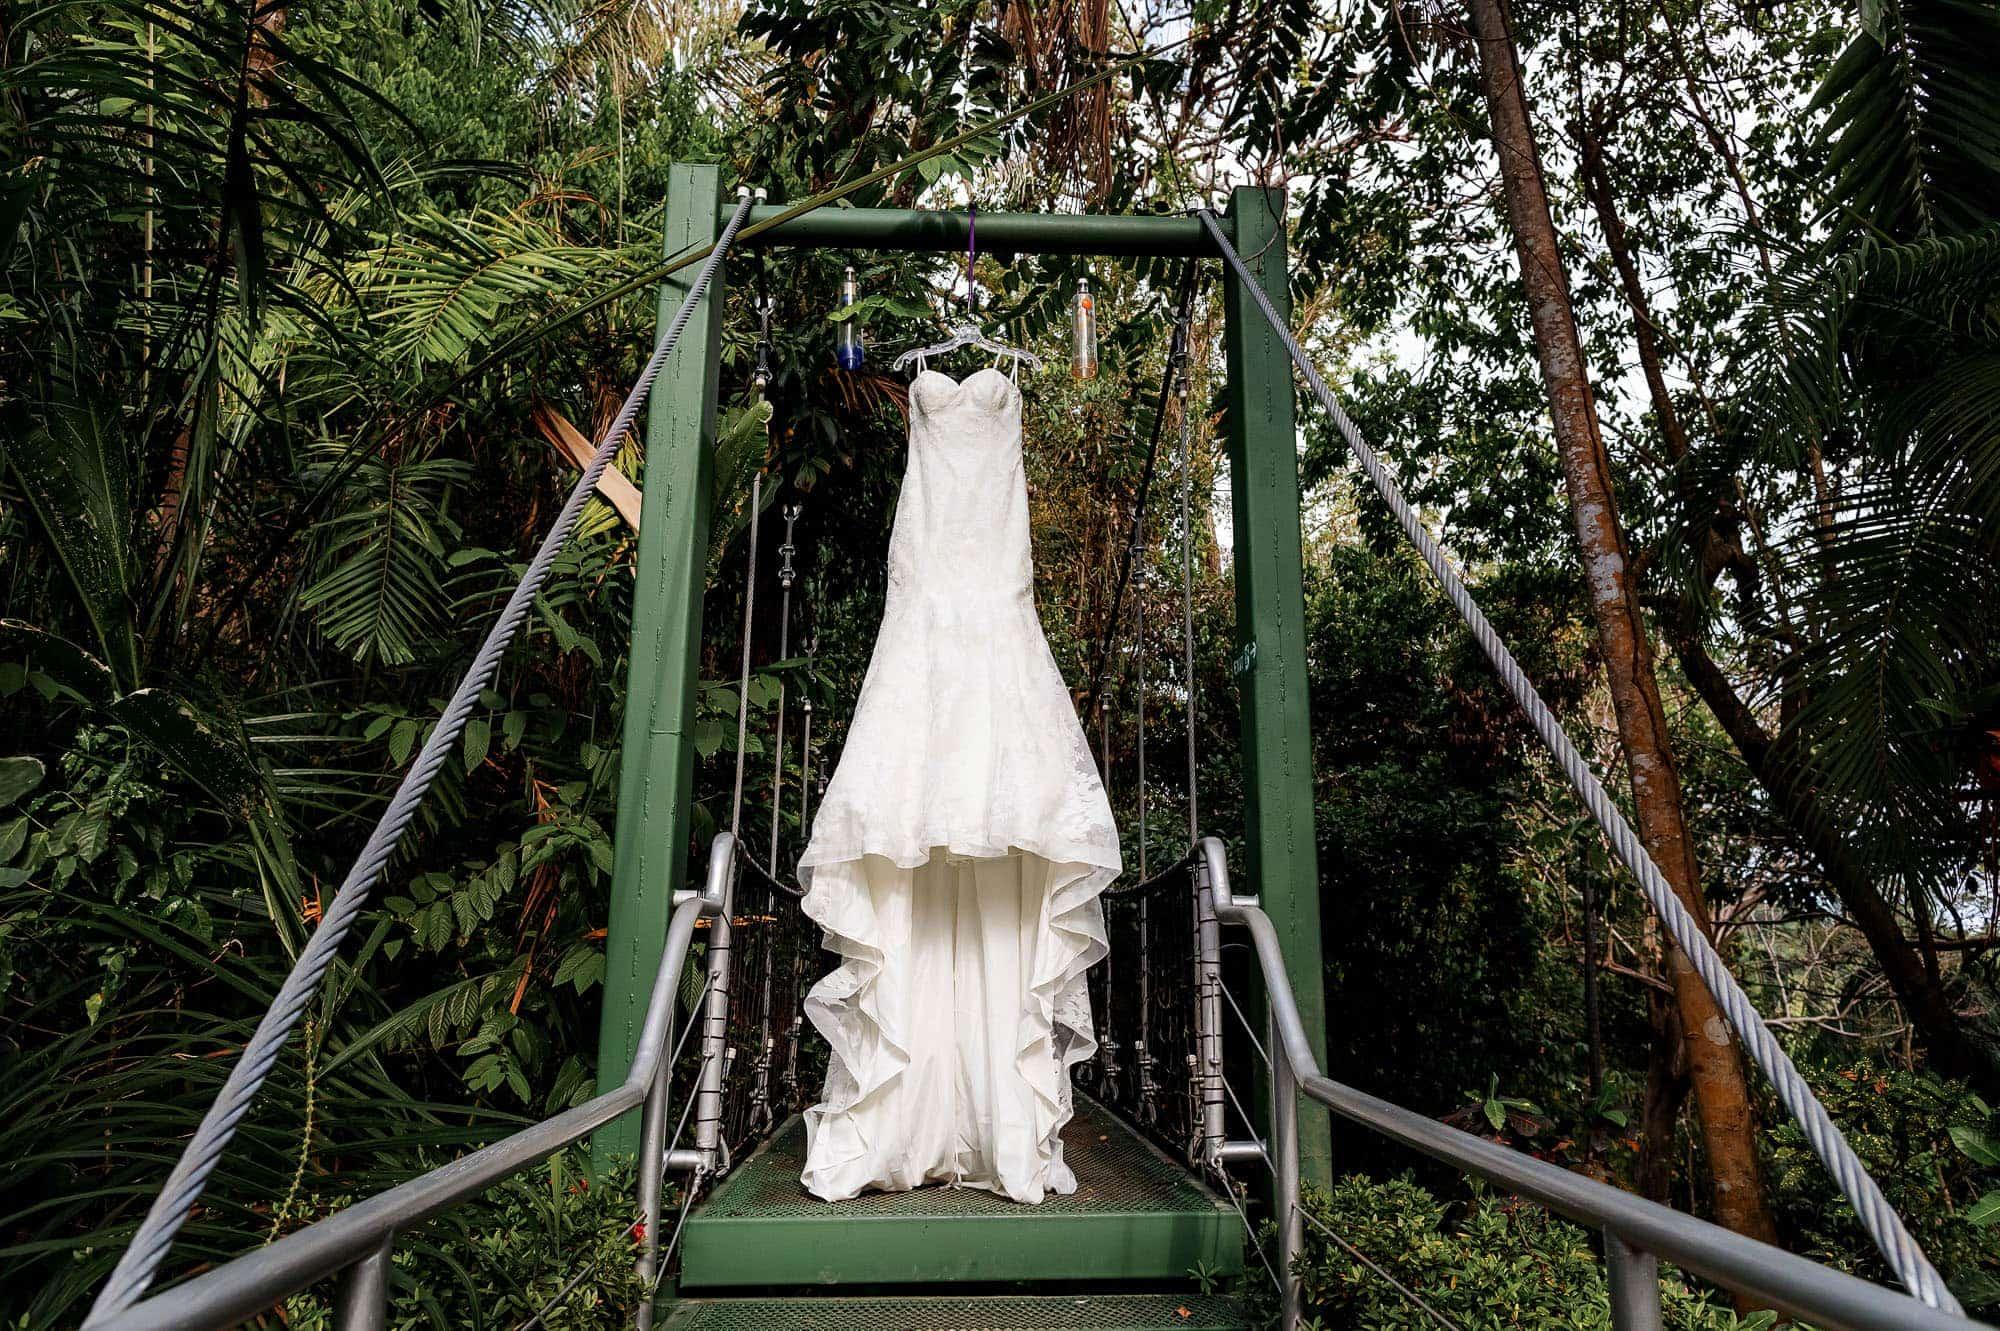 The elegant formal wedding gown hanging in the hanging bridge at Costa Verde